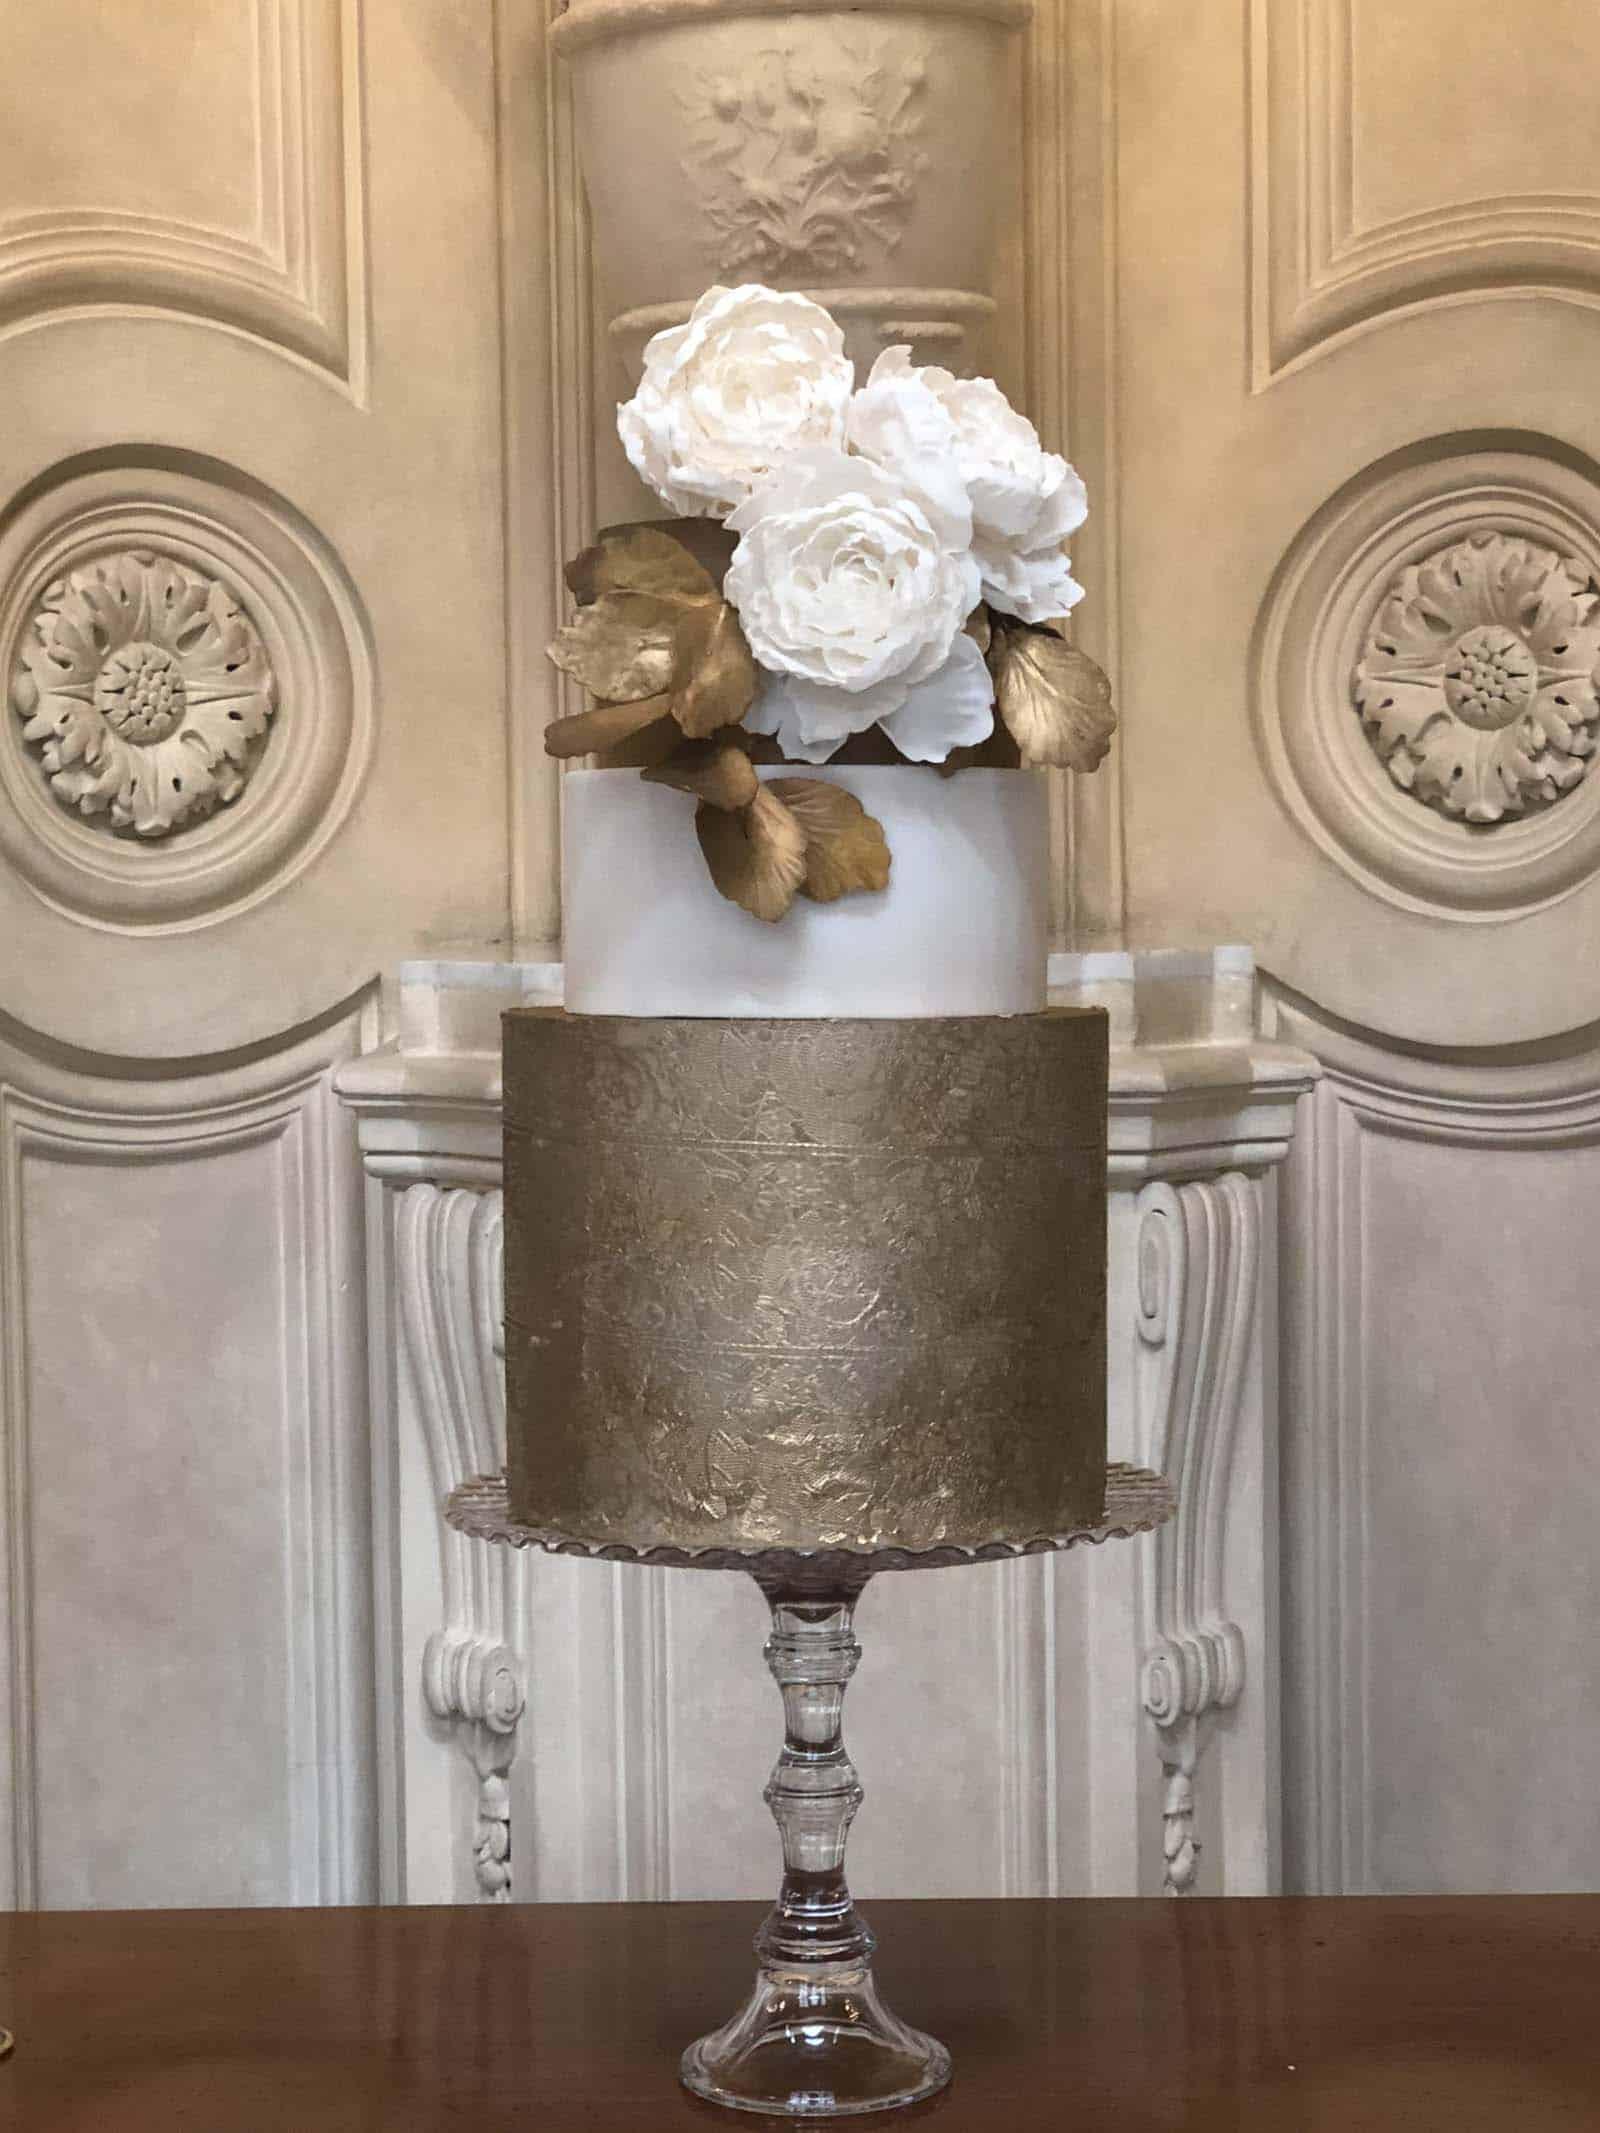 Elegant Gold Lace Wedding Cake at Four Seasons Florence by Tuscan Wedding Cakes